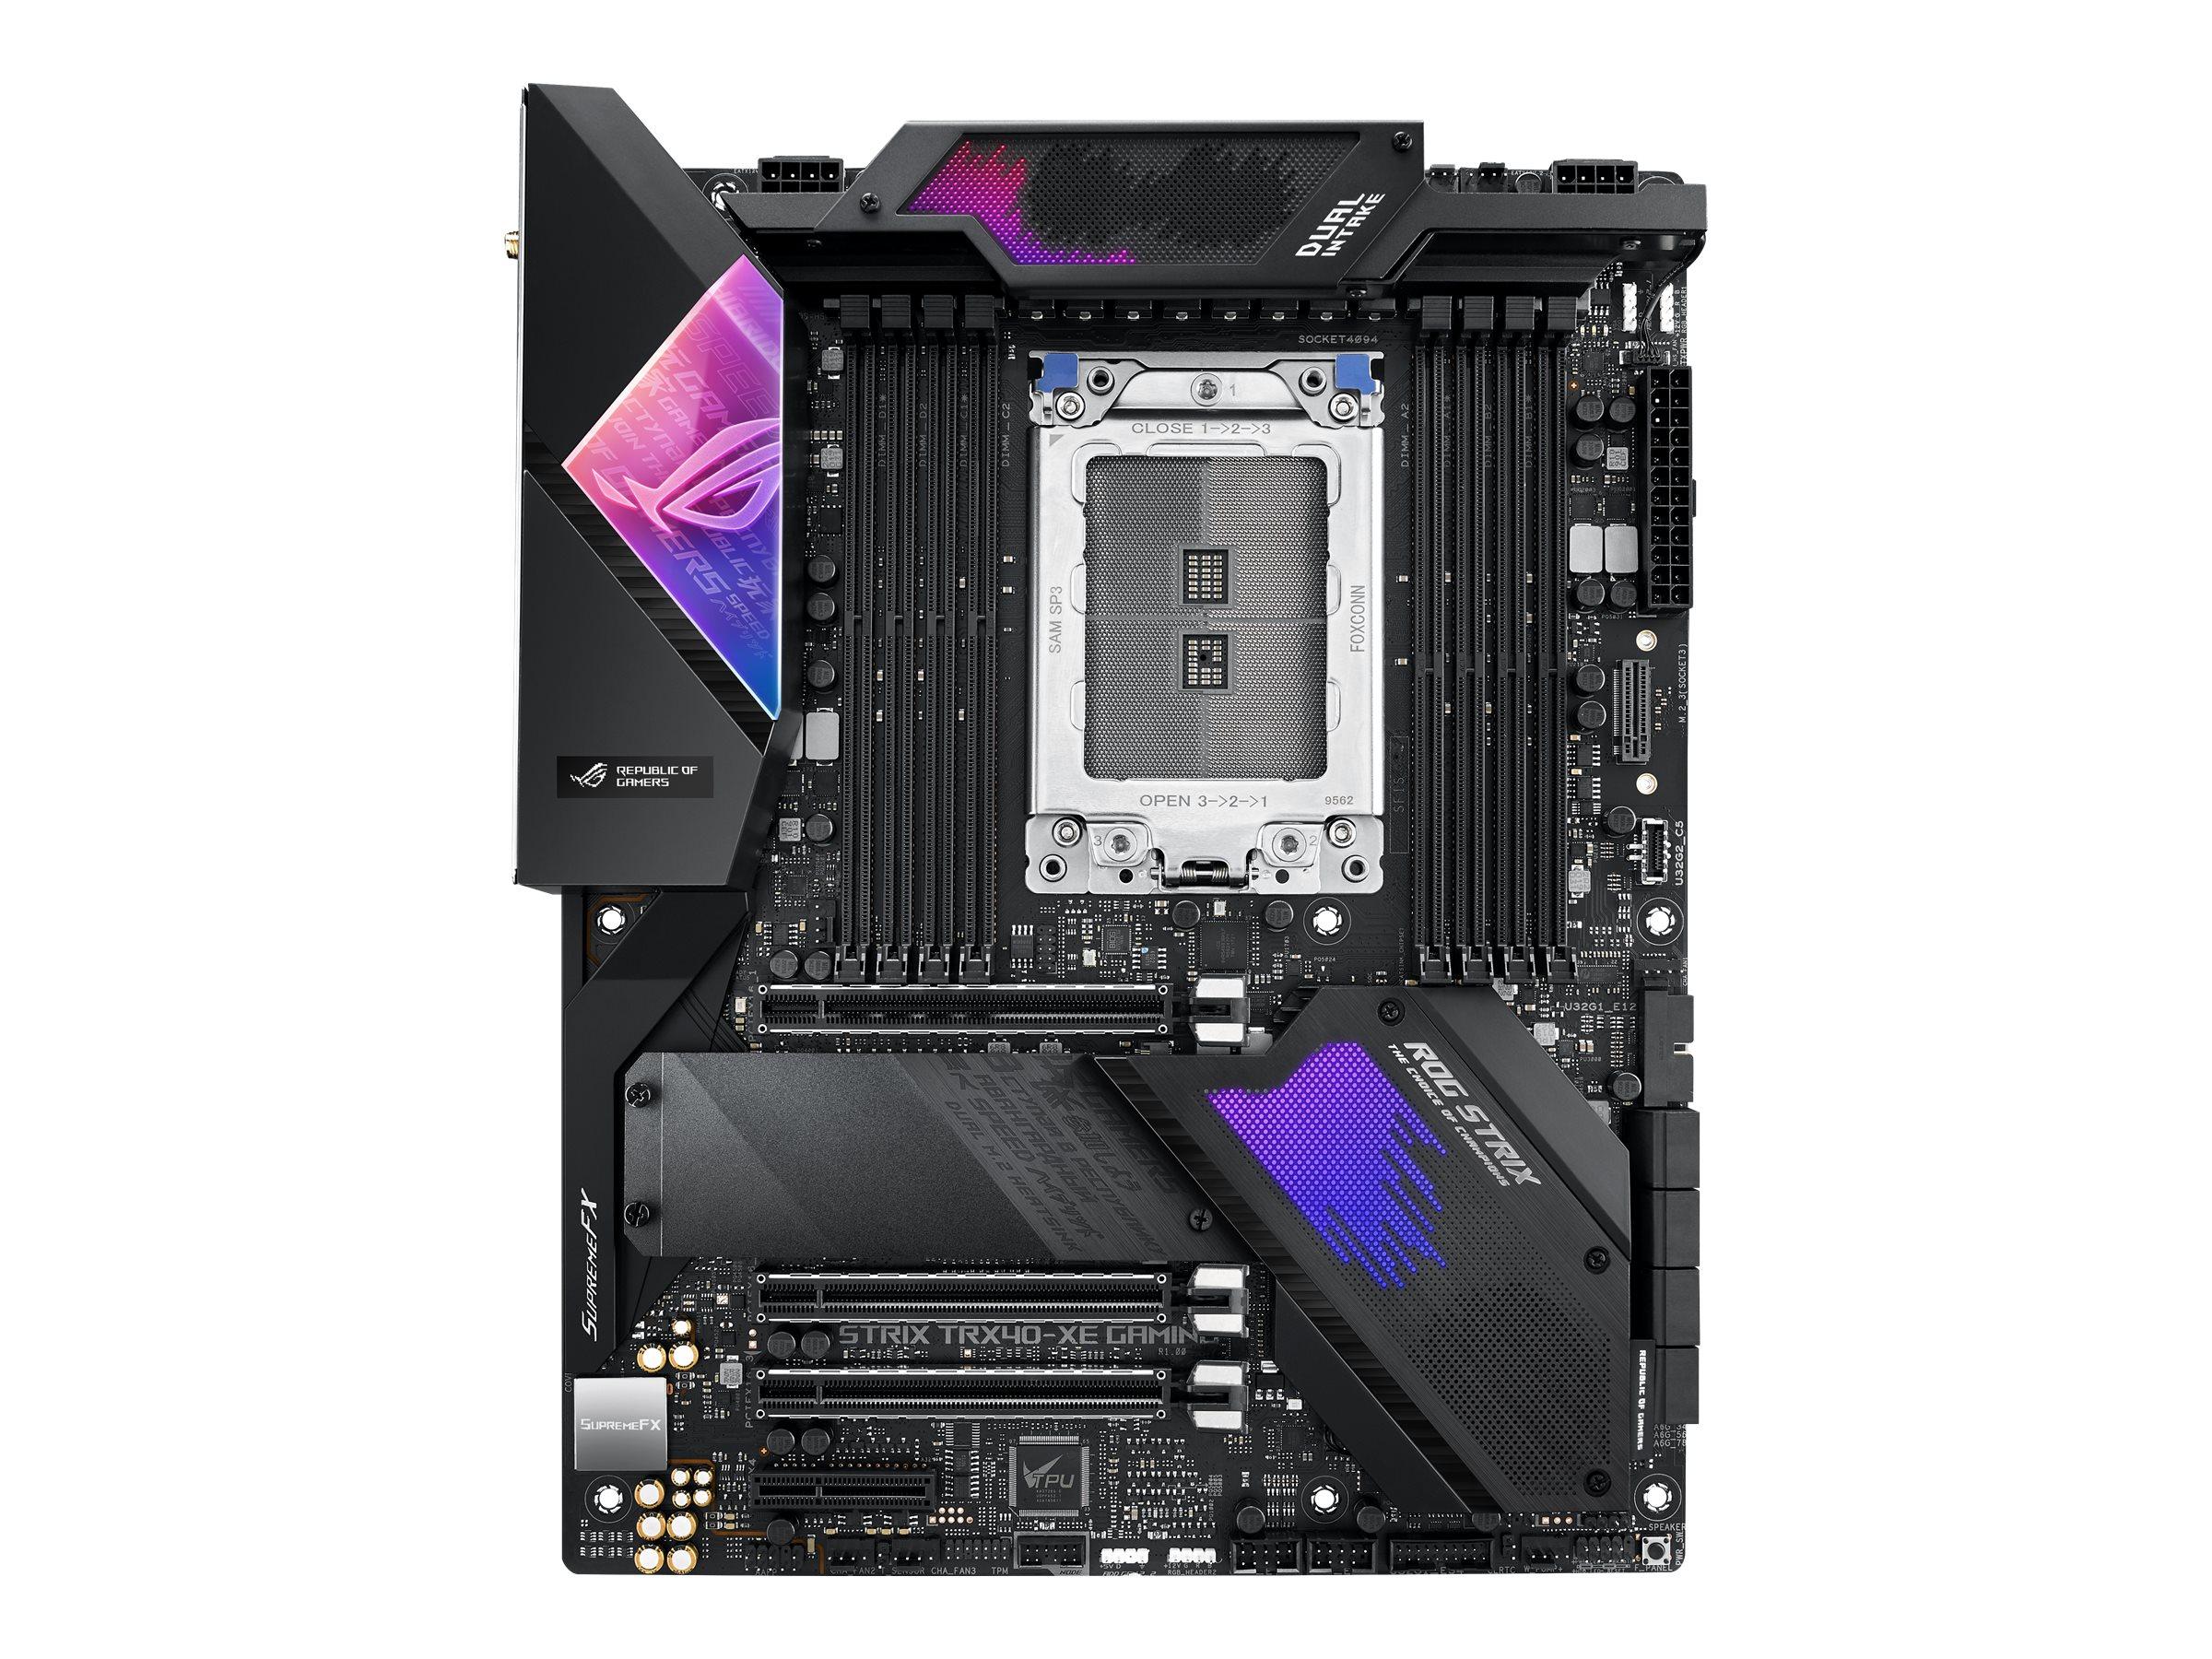 ASUS ROG STRIX TRX40-XE GAMING - Motherboard - ATX - Socket sTRX4 - AMD TRX40 - USB-C Gen2, USB 3.2 Gen 1, USB 3.2 Gen 2